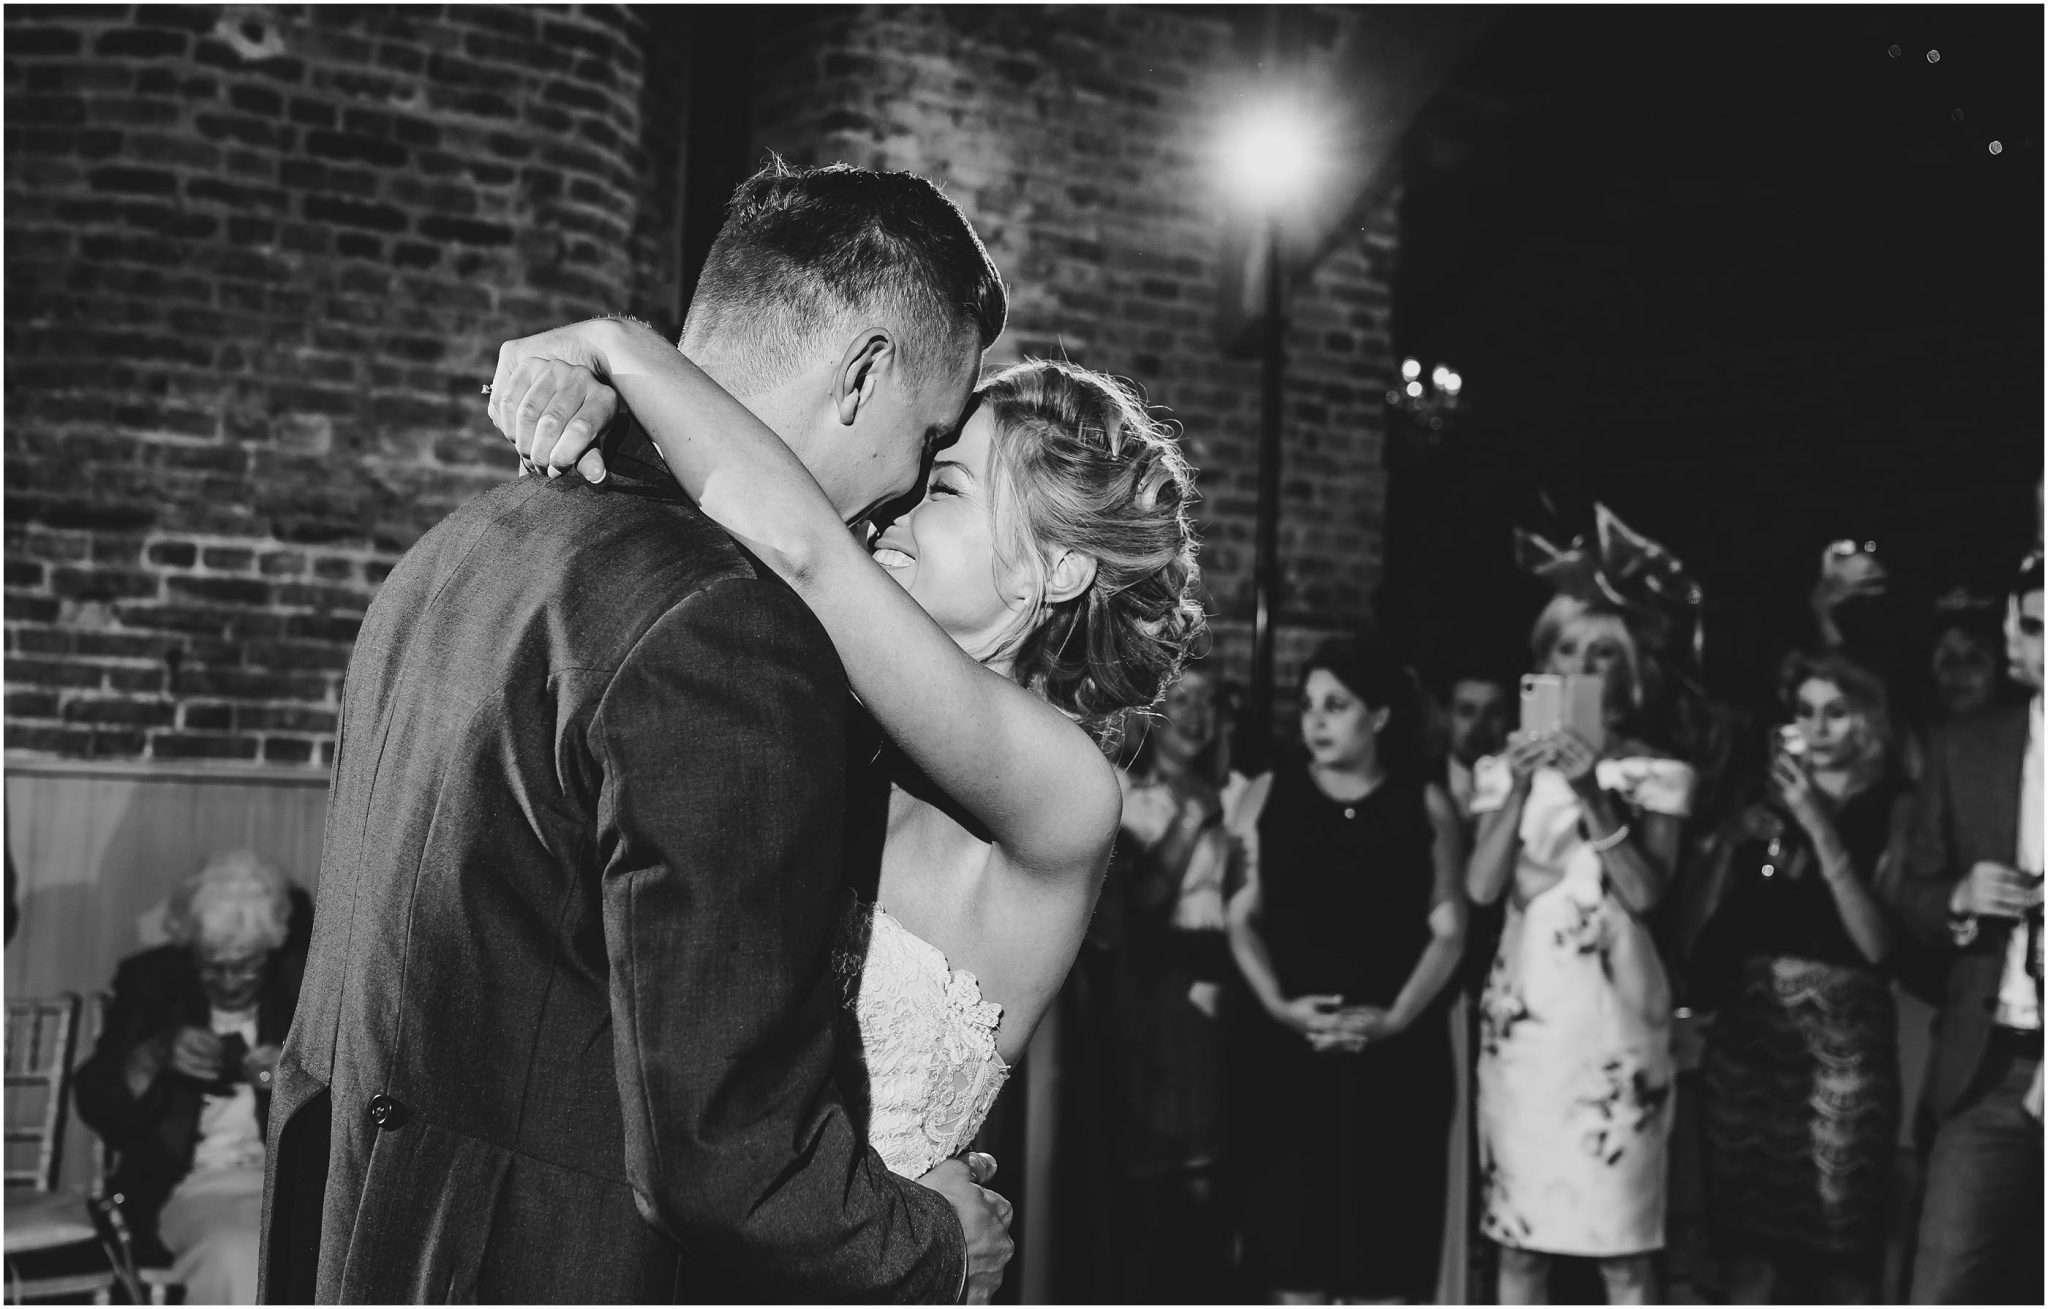 MELISSA & NATHAN'S ELMS BARN WEDDING - NORFOLK WEDDING PHOTOGRAPHER